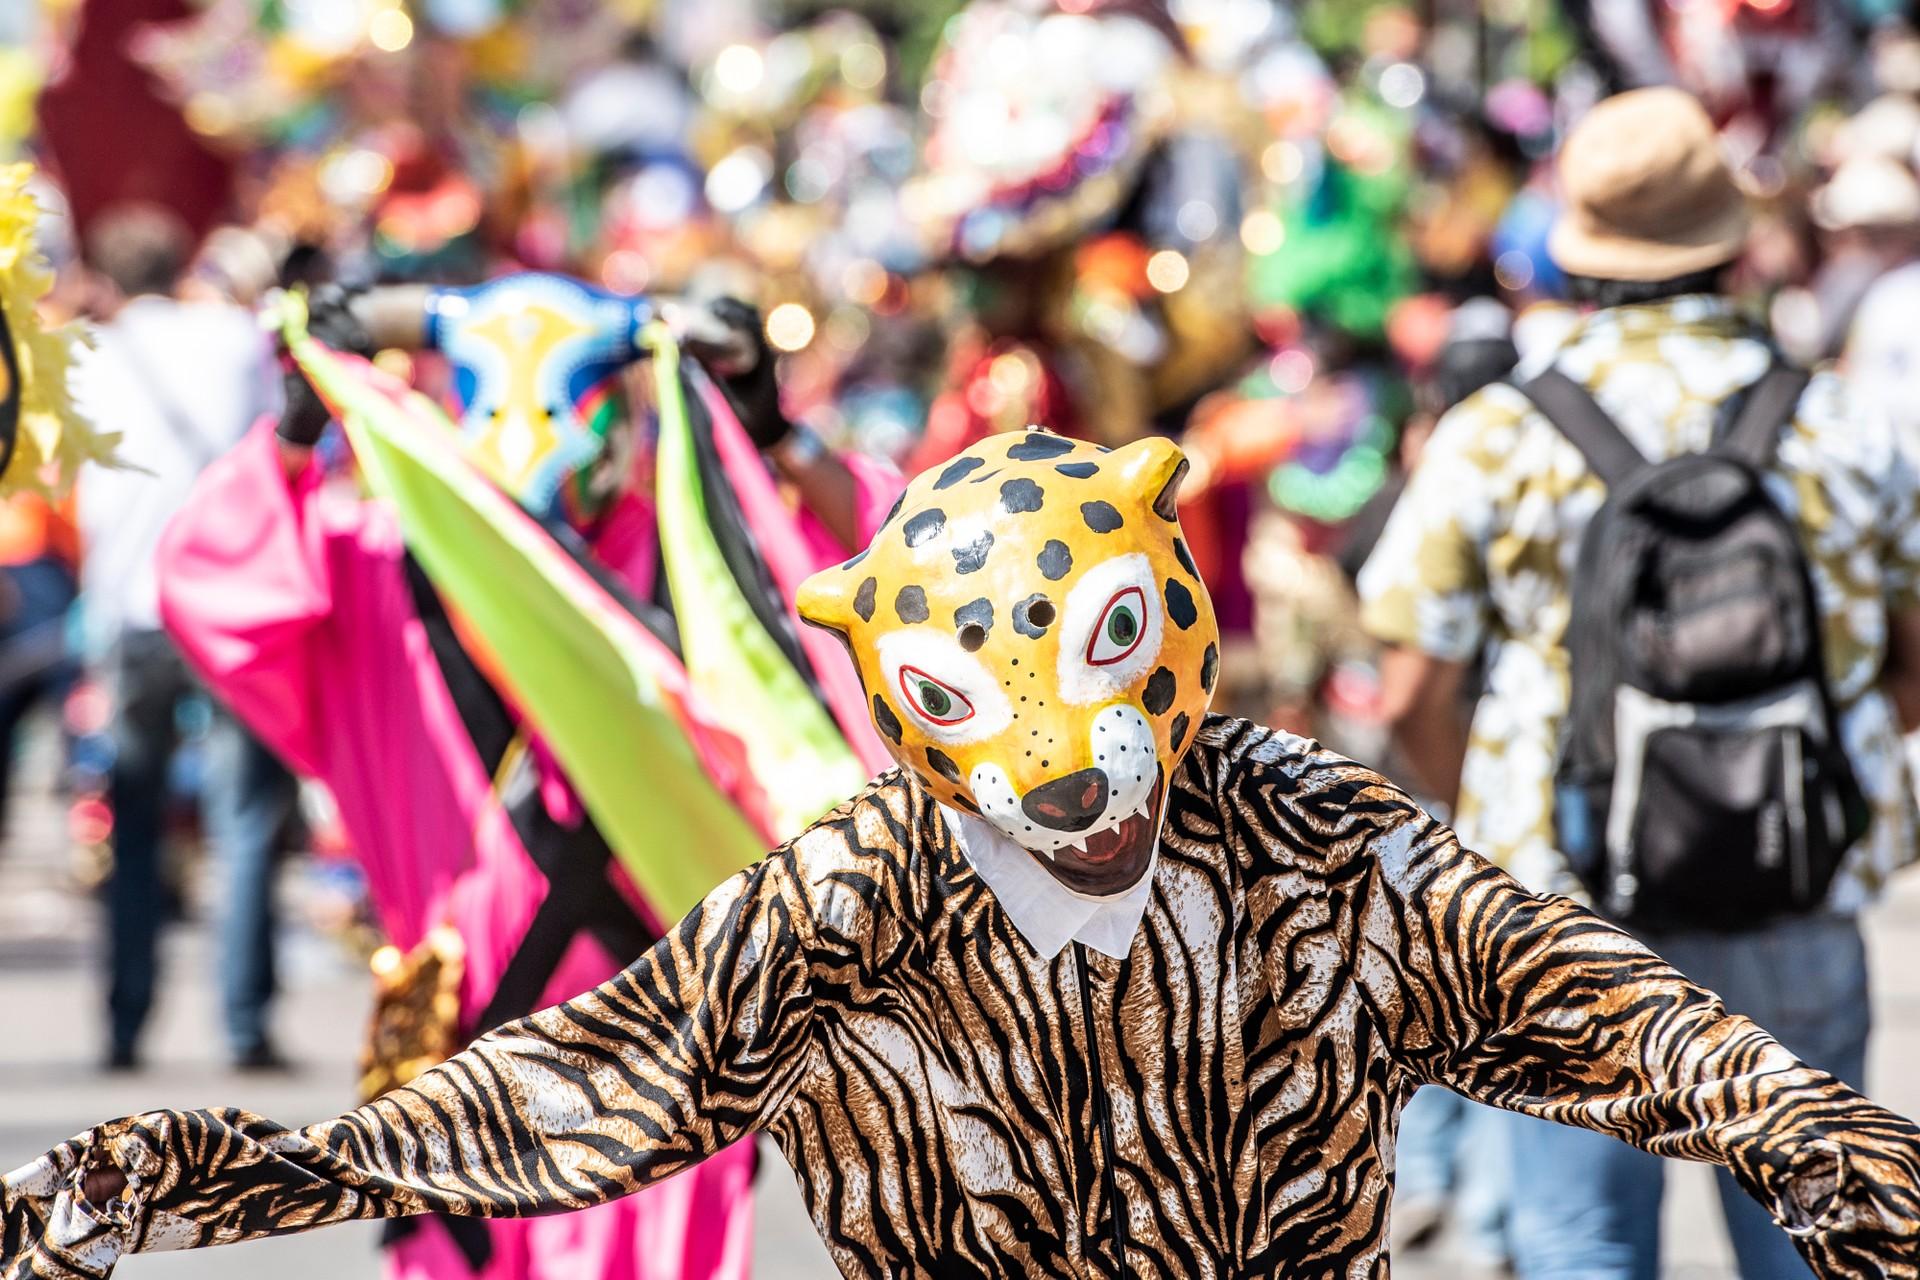 Costume in Barranquilla's carnival, Colombia